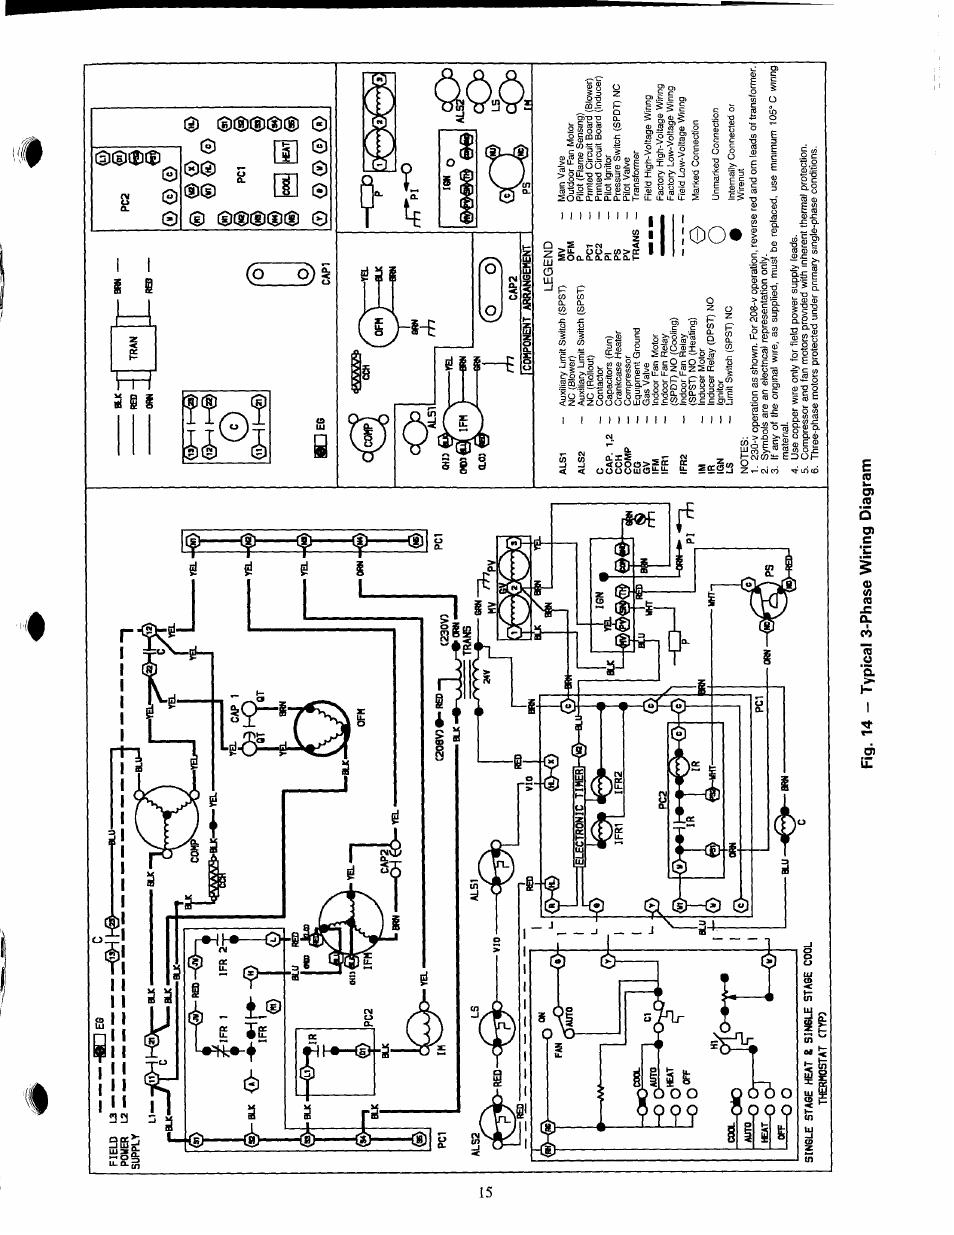 carrier gas furnace 58d schematic